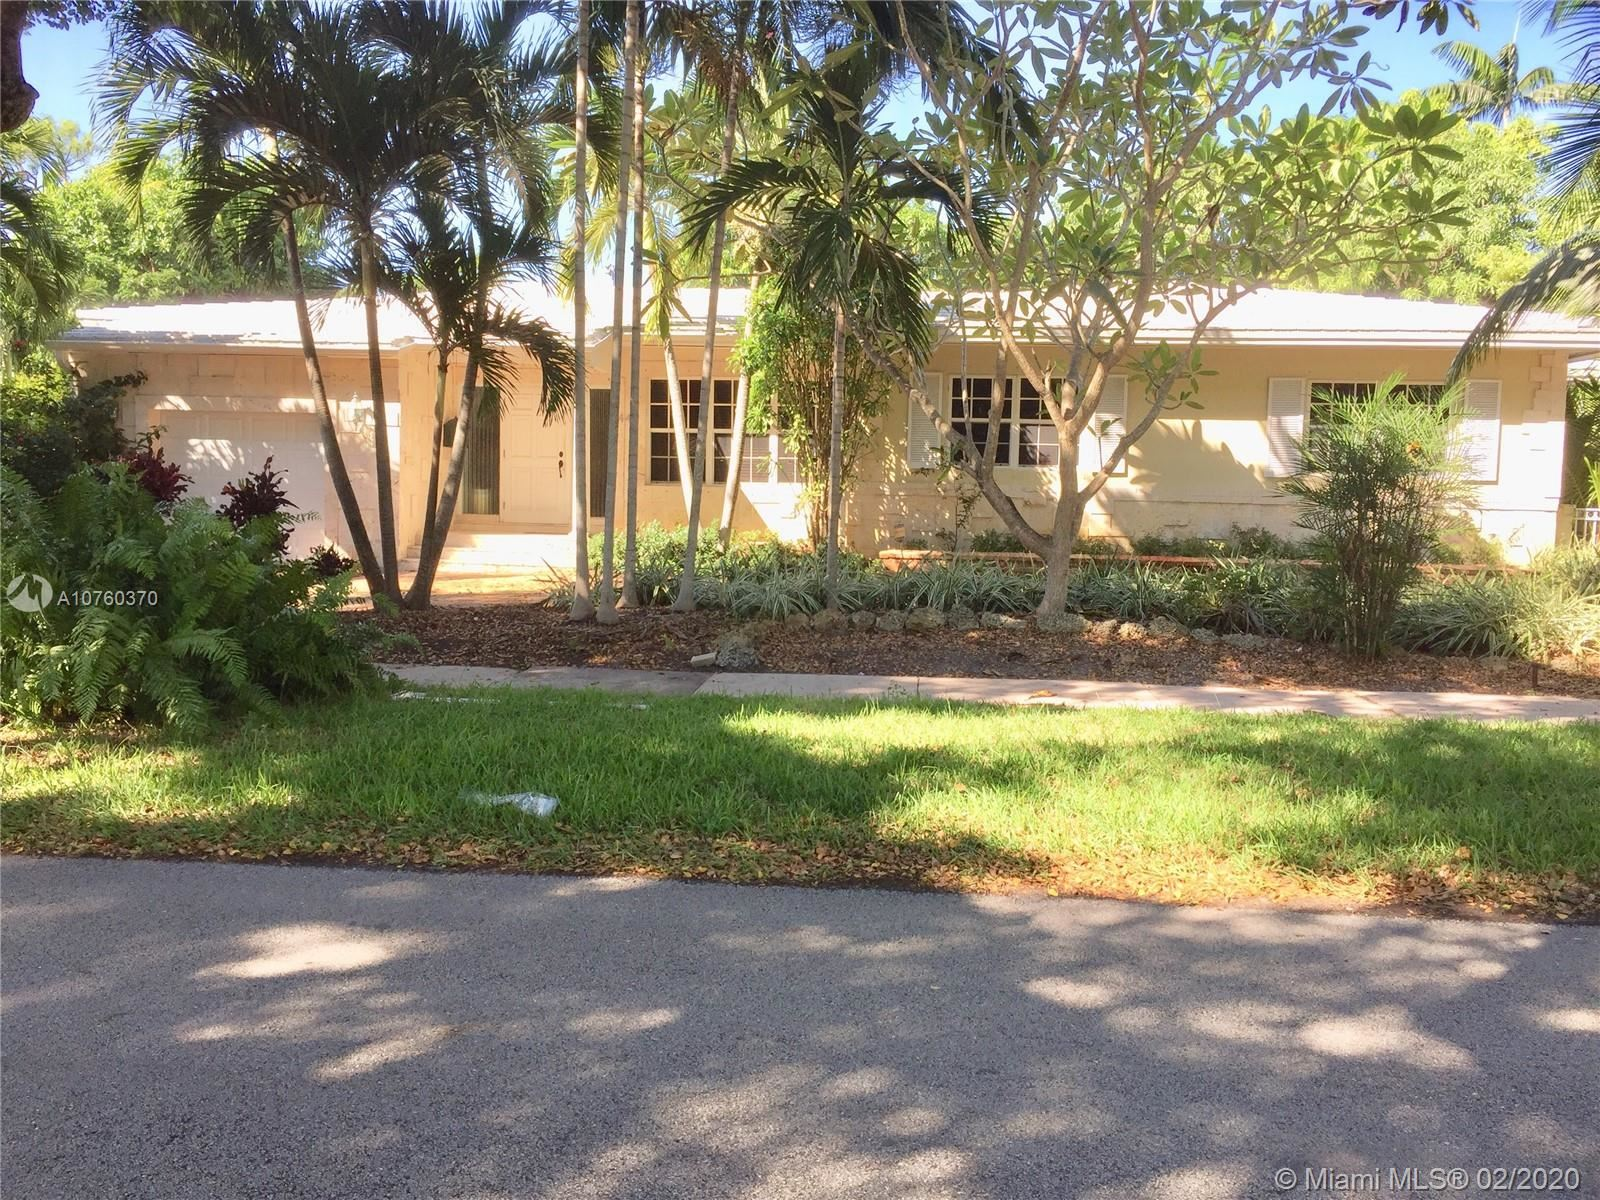 445 Aledo Ave, Coral Gables, FL 33134 - #: A10760370